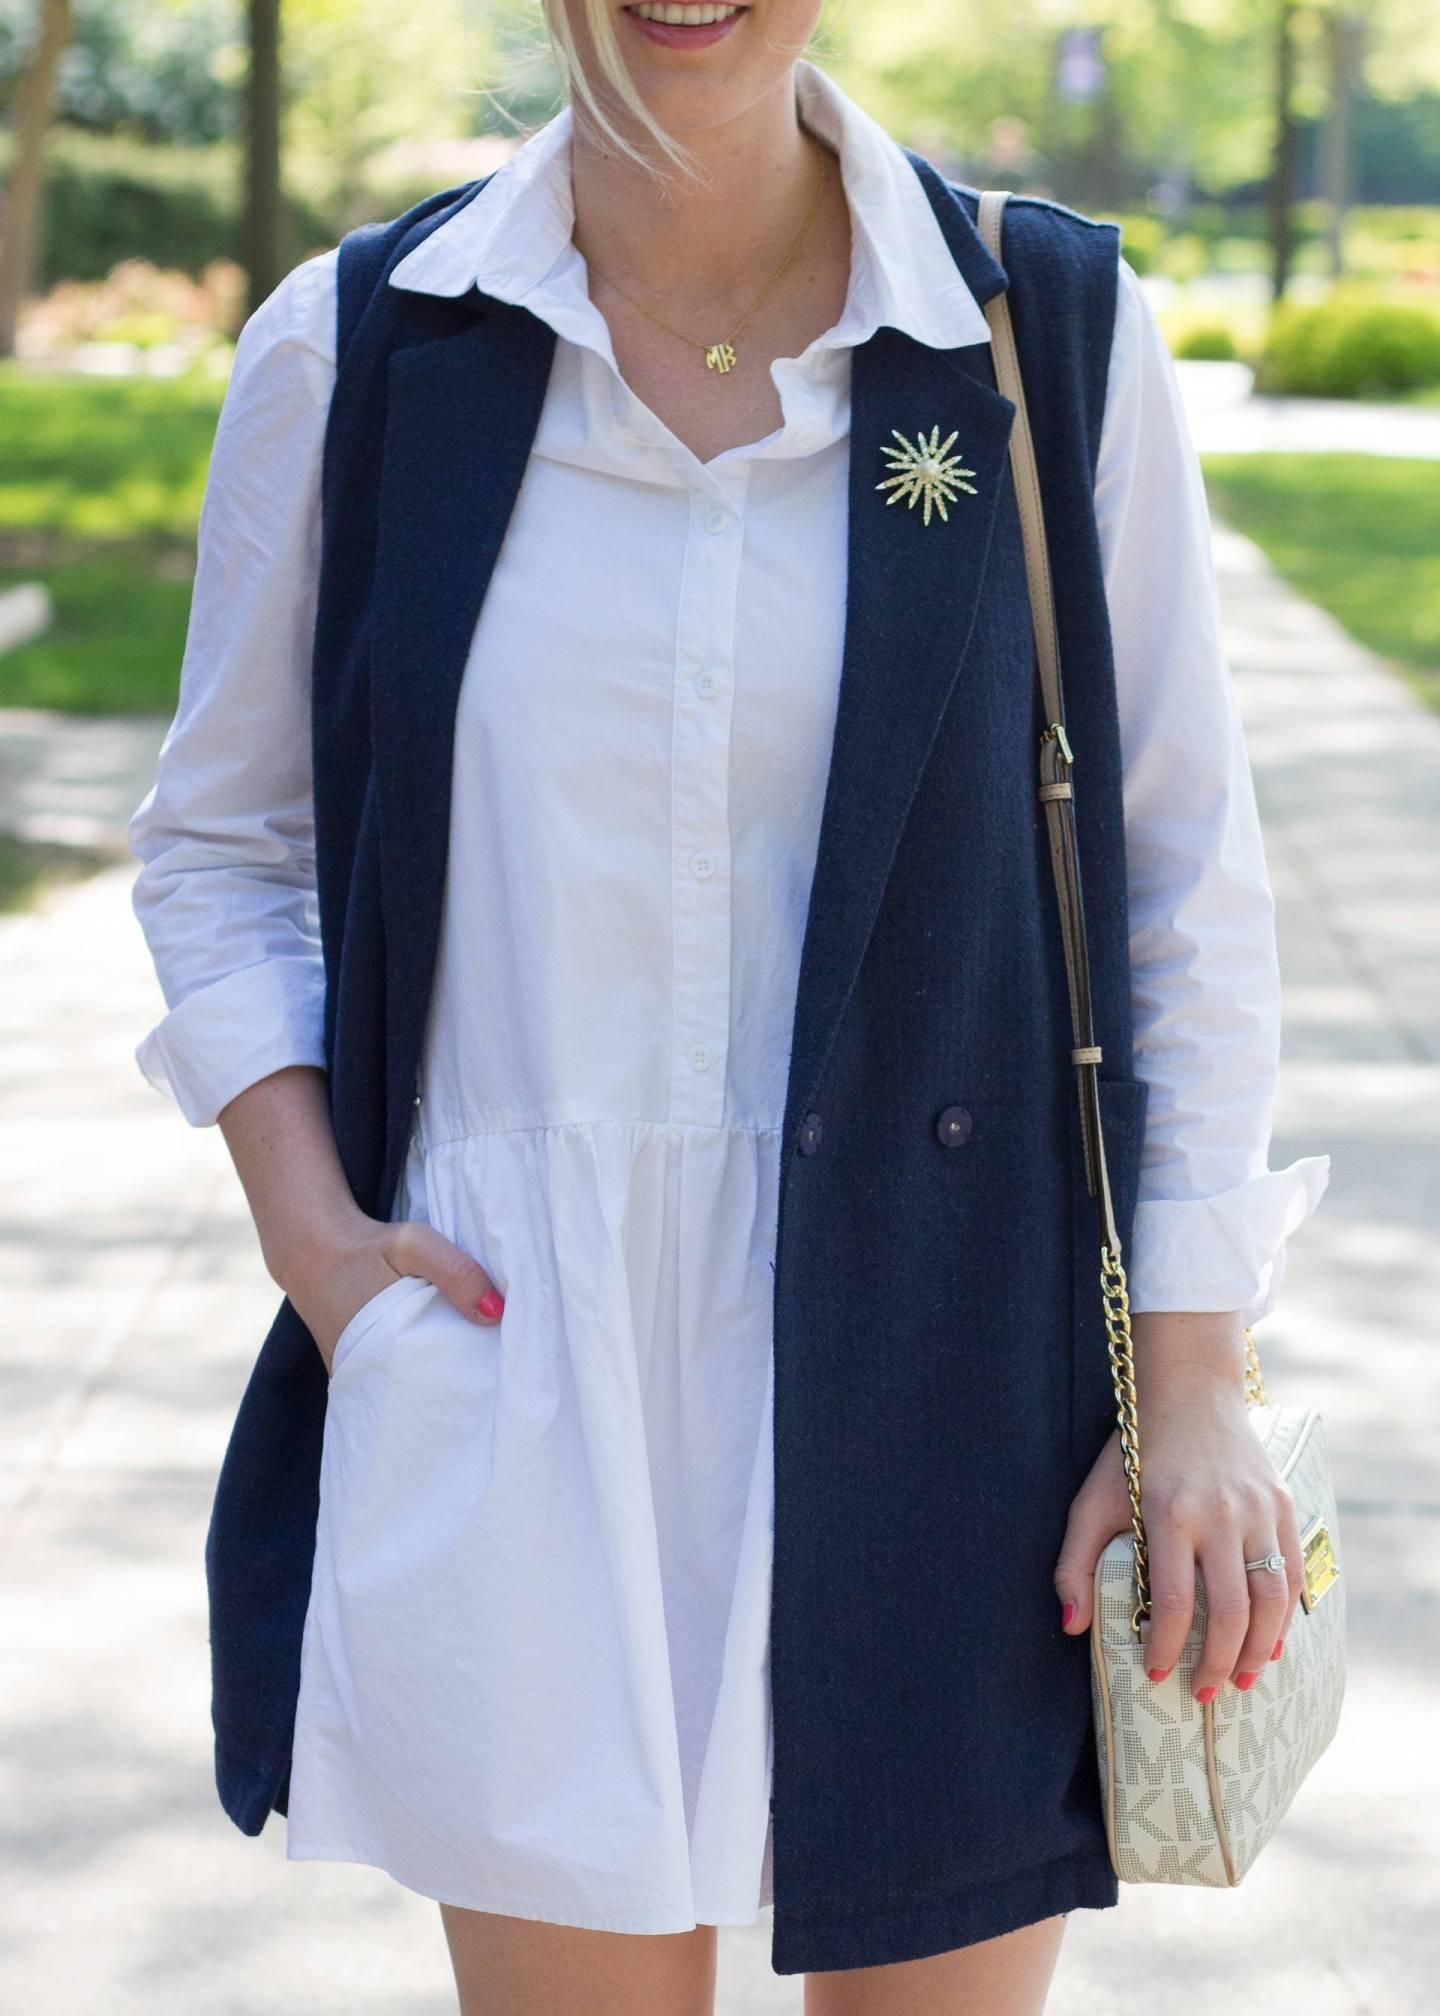 The Best $25 Little White Dress.